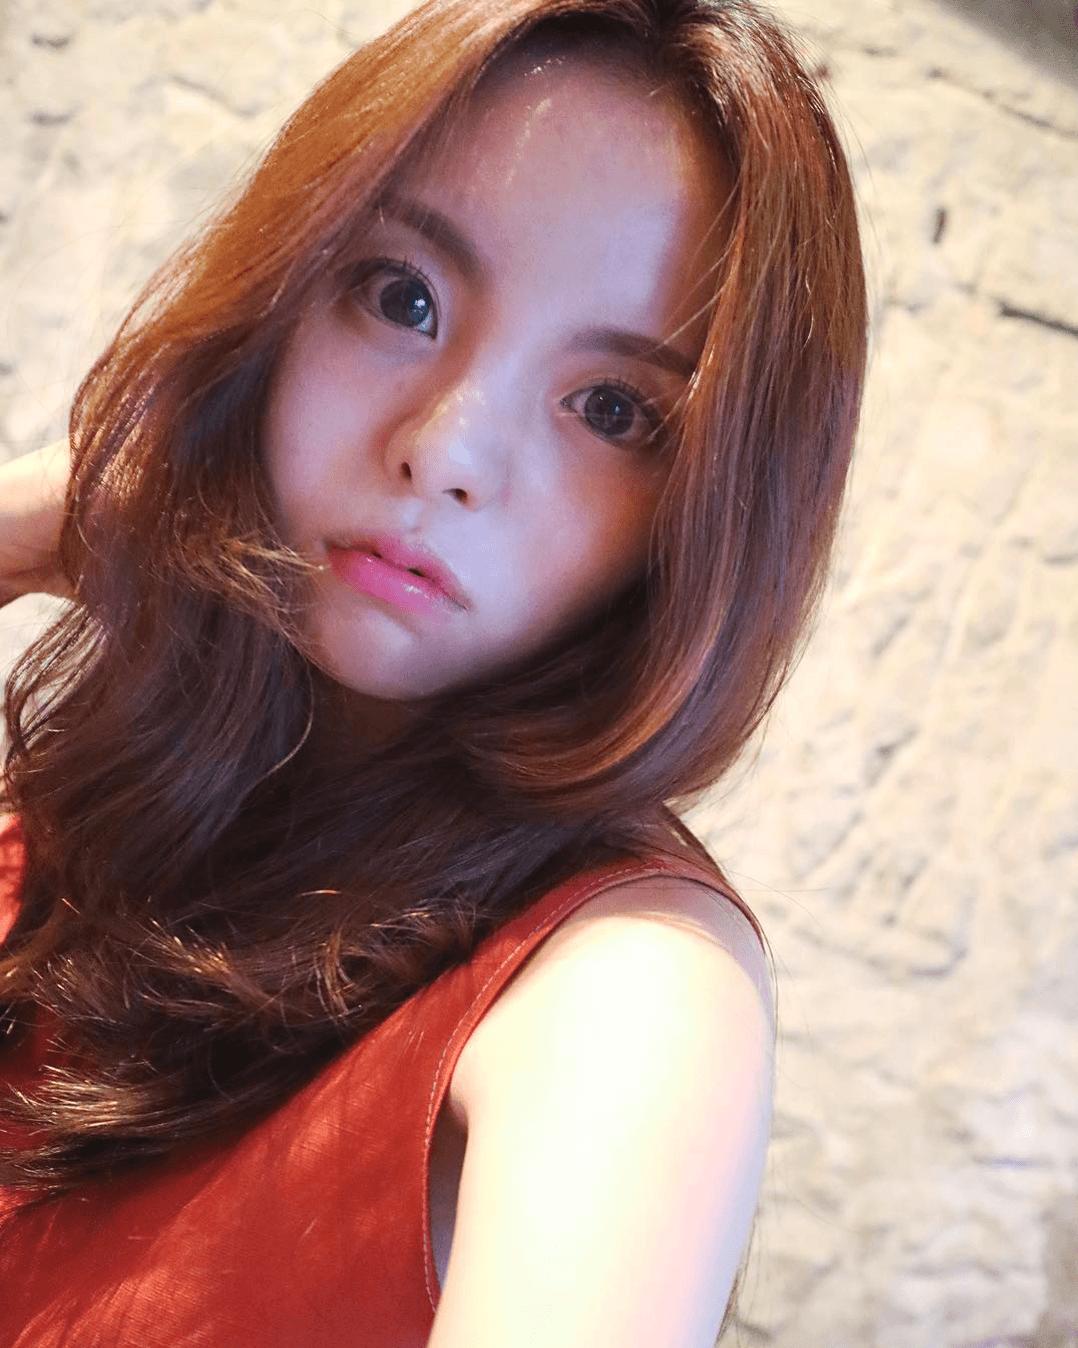 BTS J-Hope's Older Sister Is Drop Dead GORGEOUS